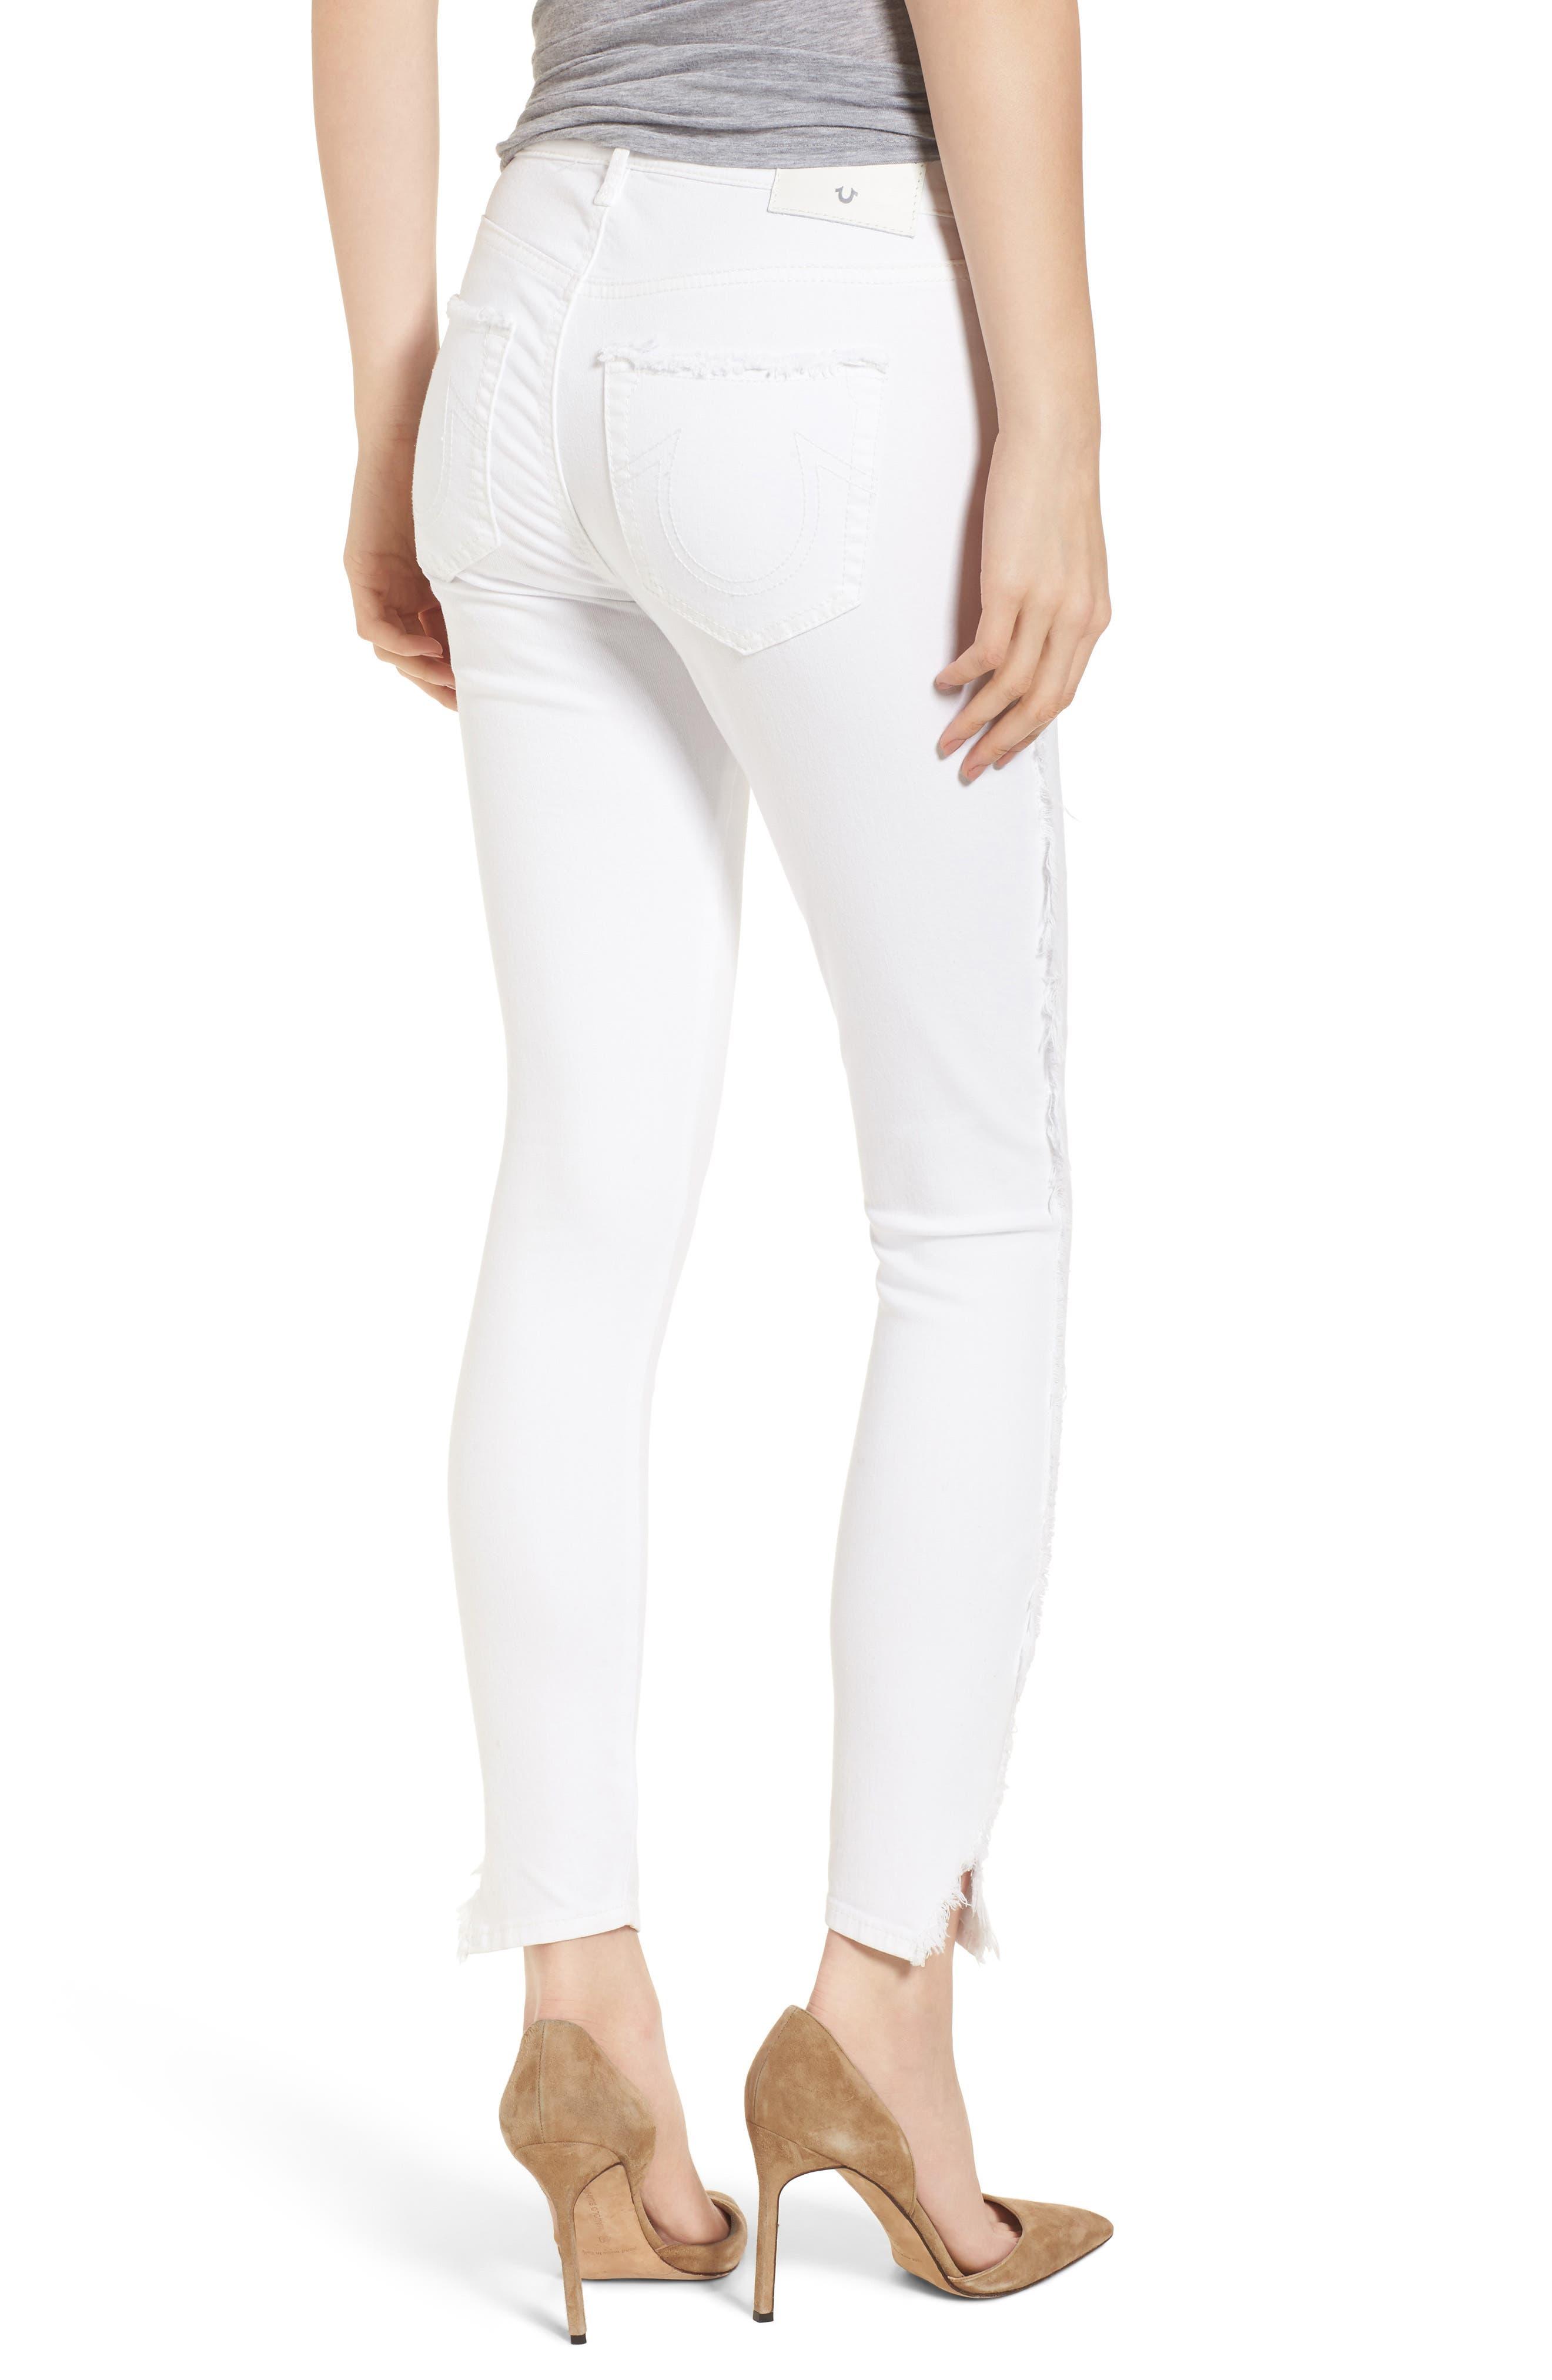 Jennie Curvy Skinny Jeans,                             Alternate thumbnail 2, color,                             Optic White